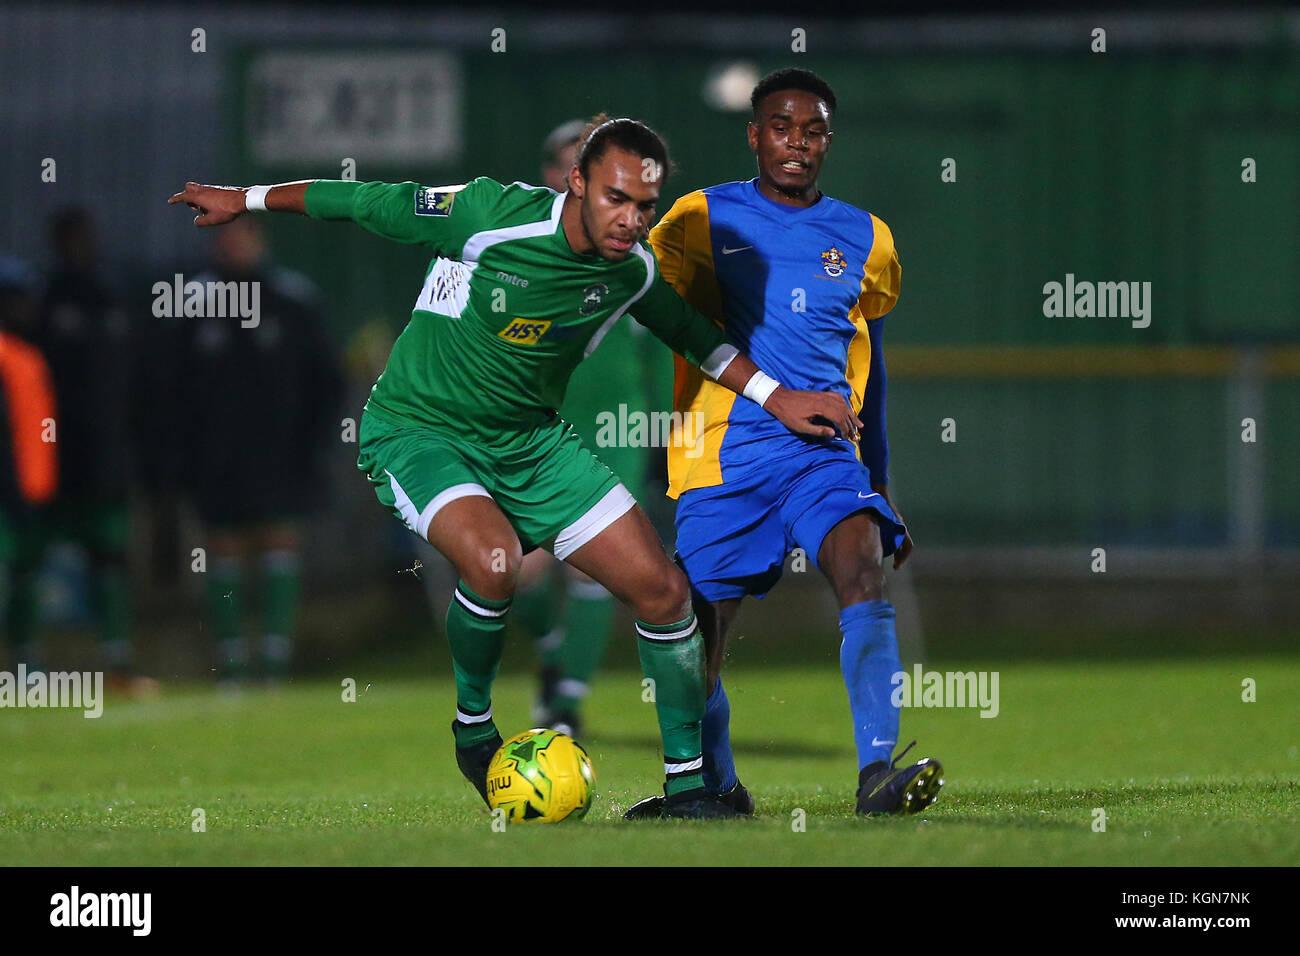 Quba Gordon of Haringey and Jonathan Nzengo of Romford during Romford vs Haringey Borough, Bostik League Division - Stock Image